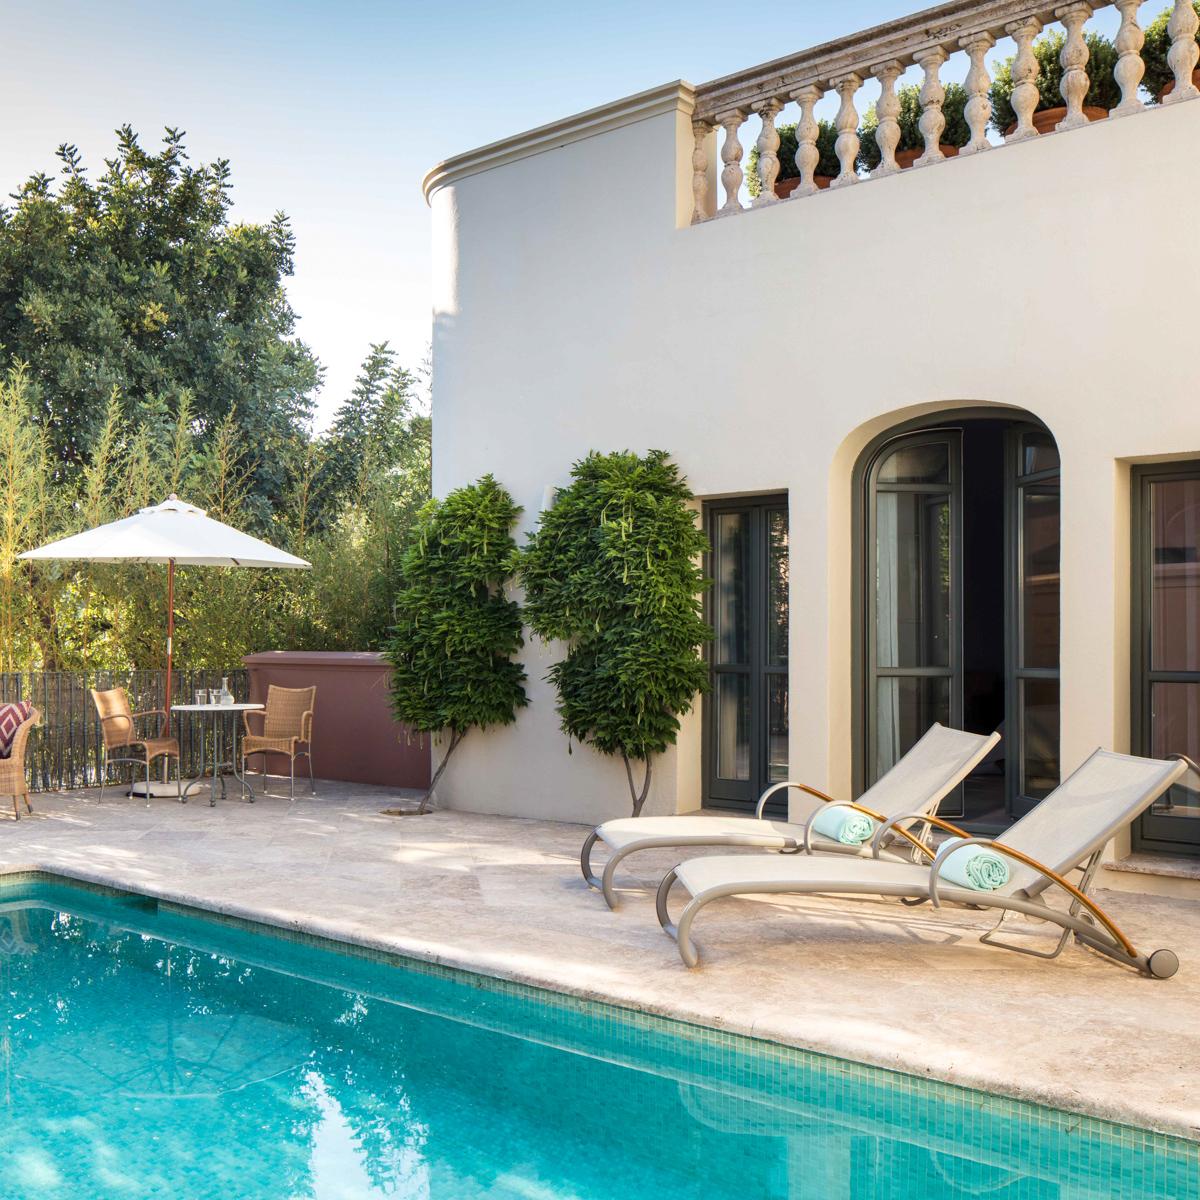 Anantara Luxus Hotel in Marbella-4